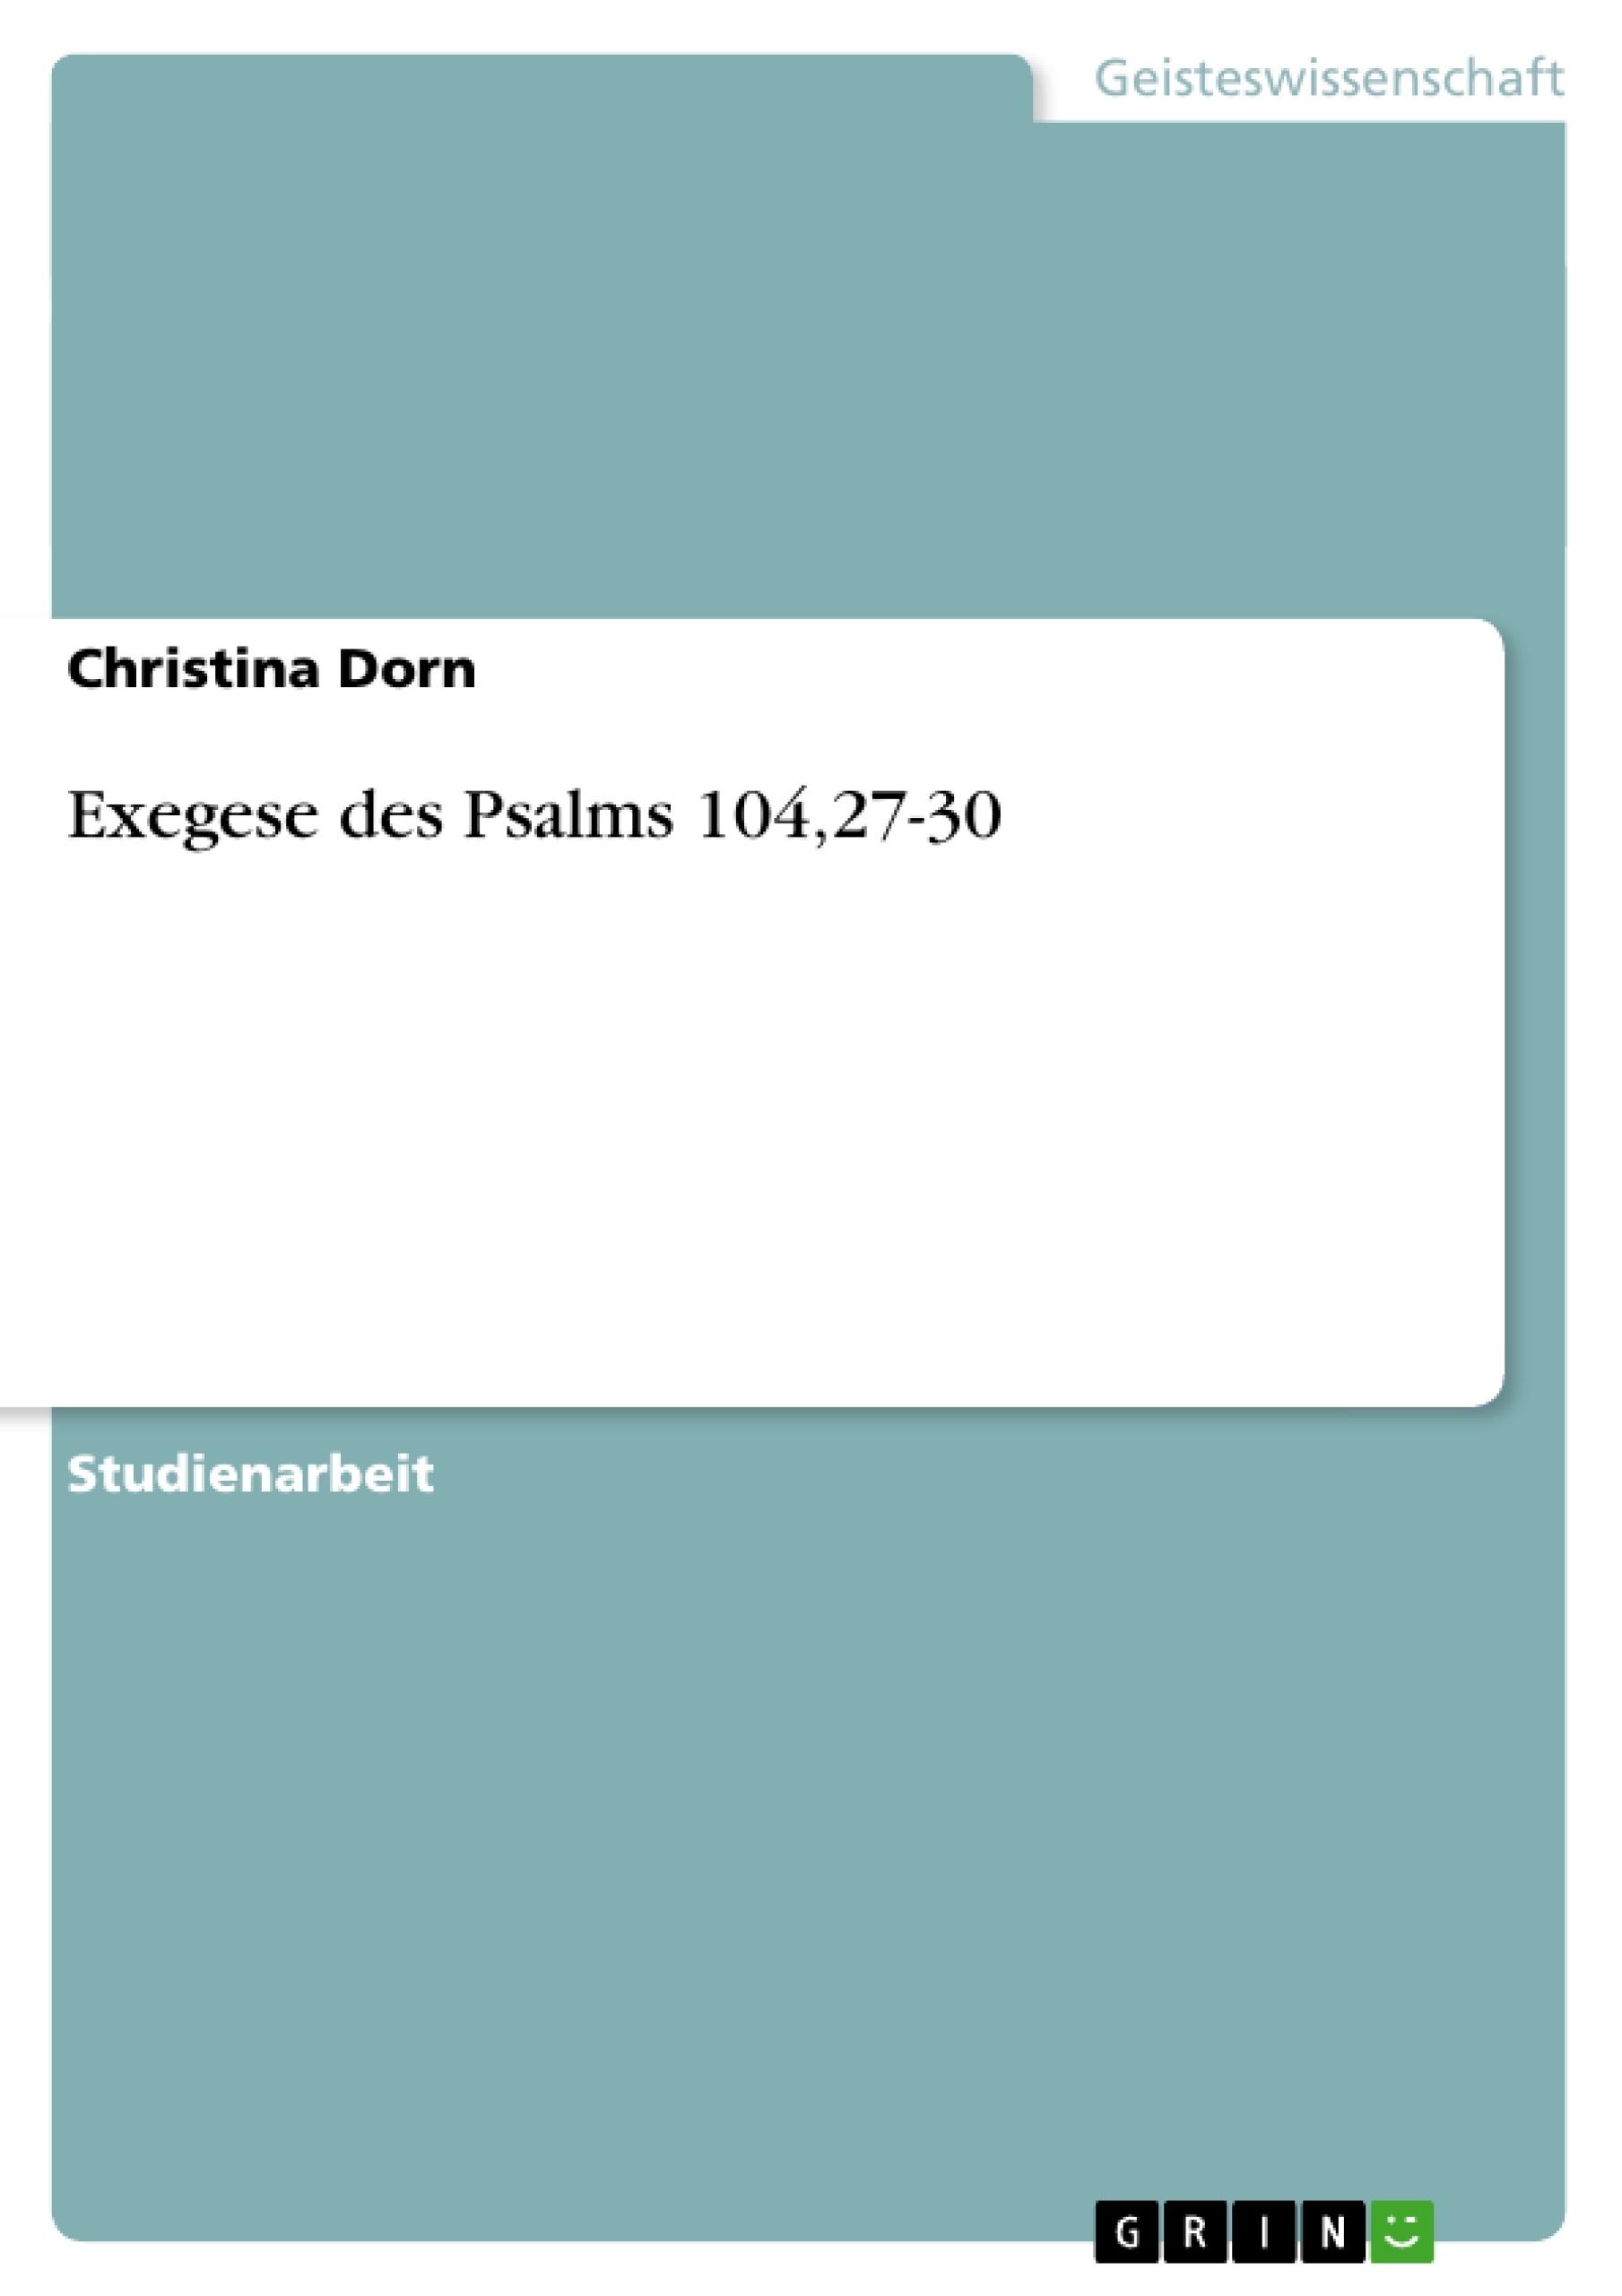 Titel: Exegese des Psalms 104,27-30